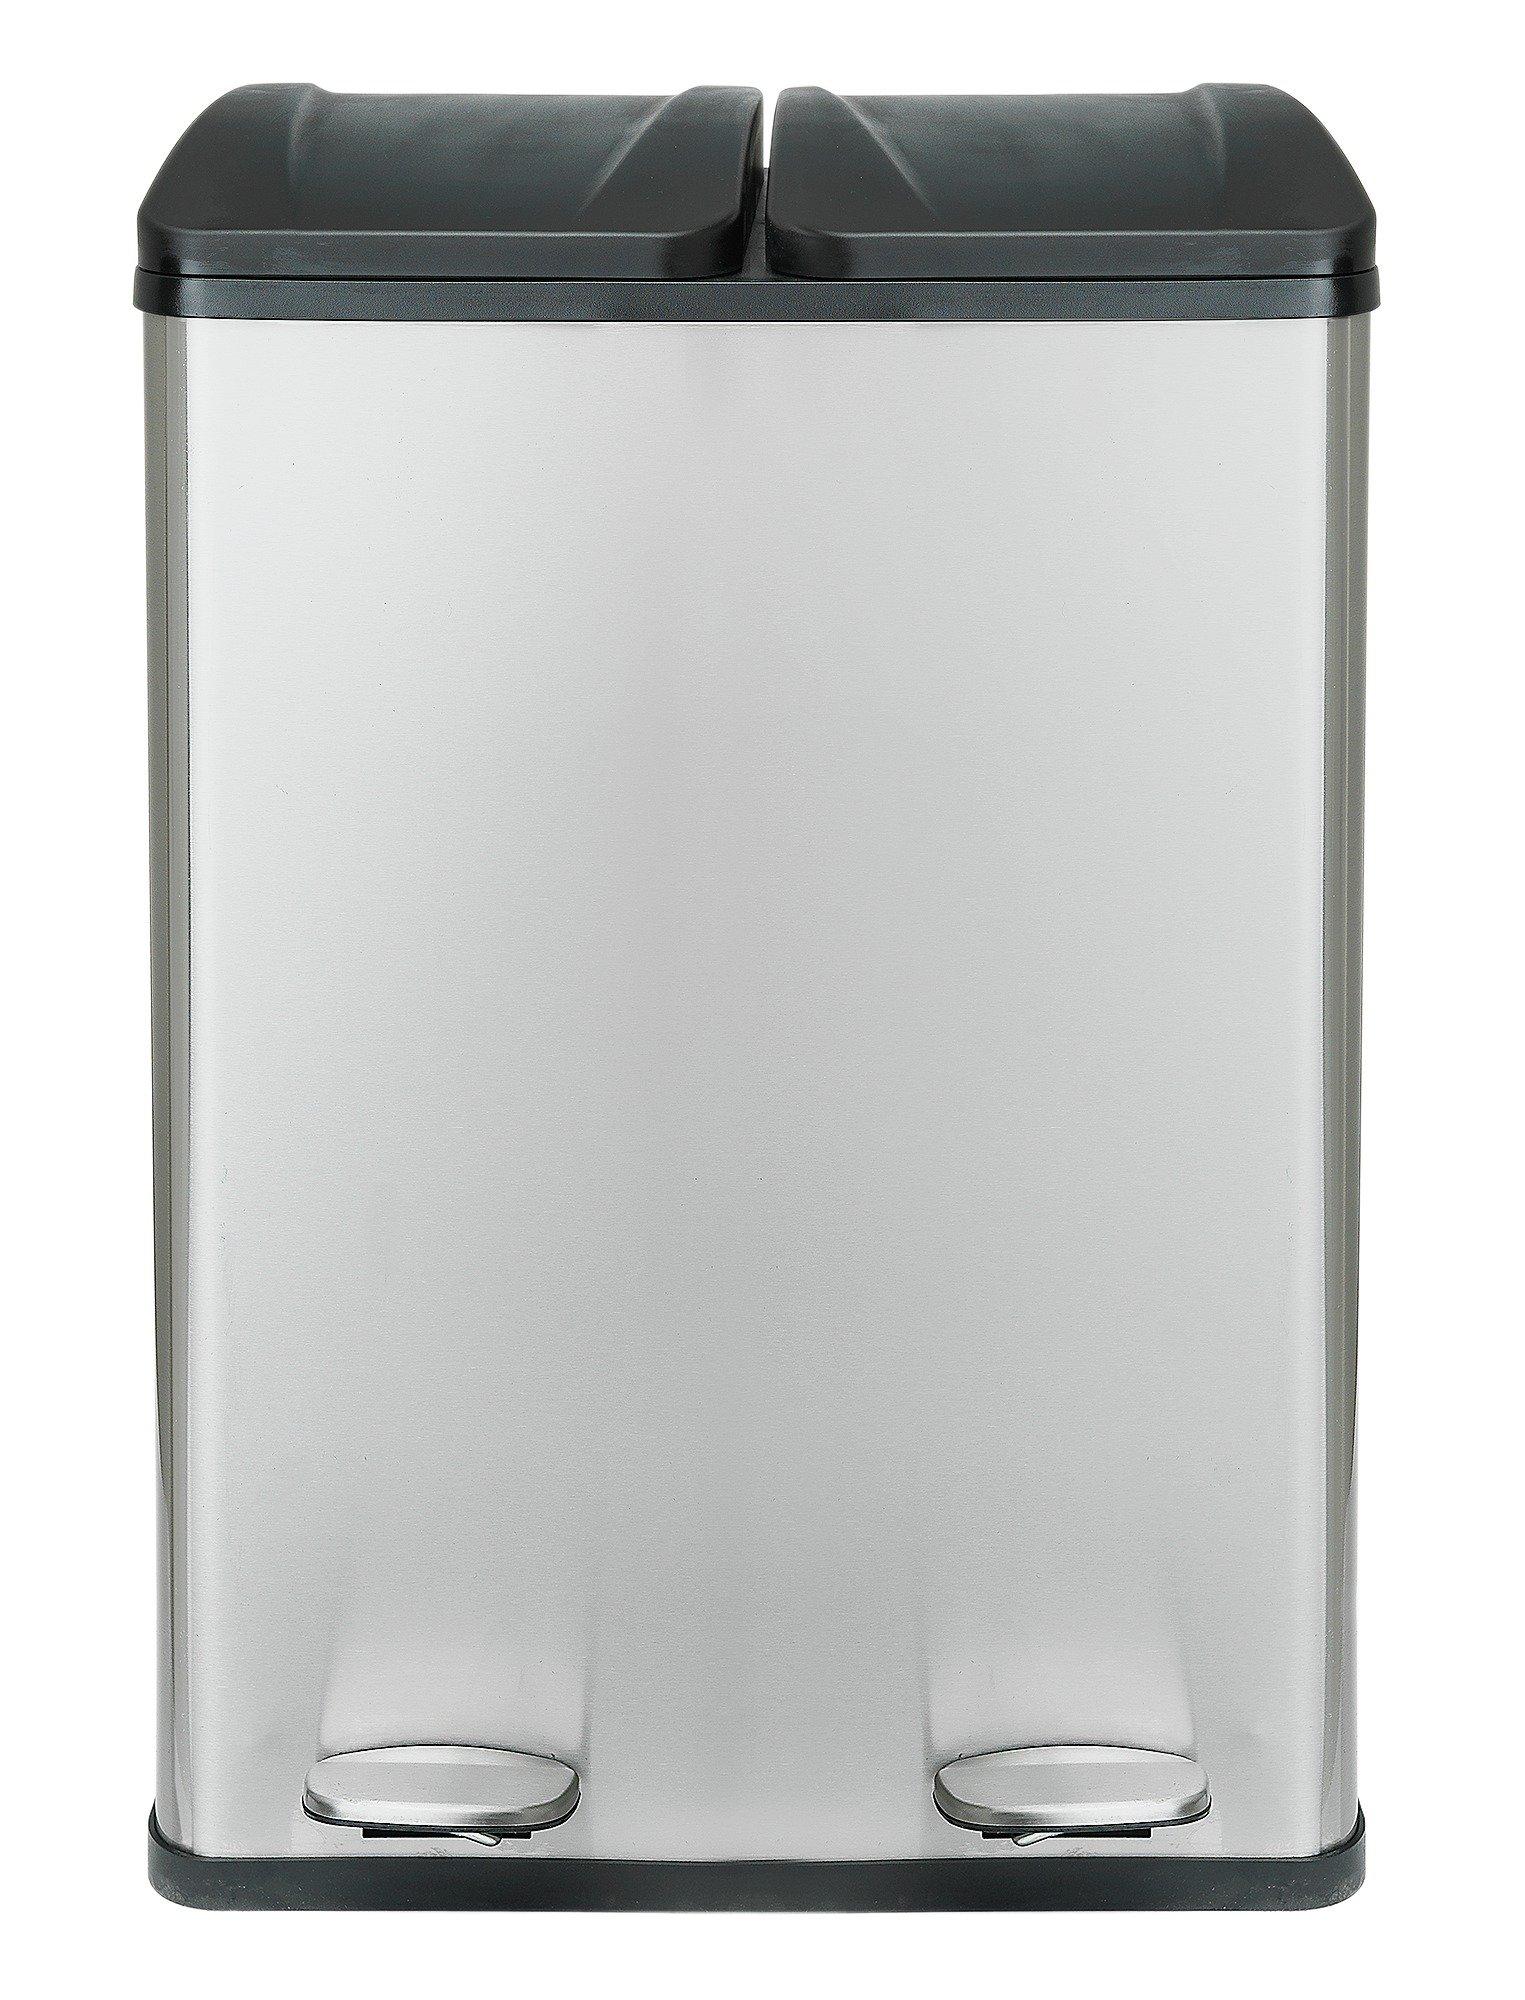 Buy Argos Home 60 Litre 2 Compartment Recycling Bin | Kitchen Bins | Argos